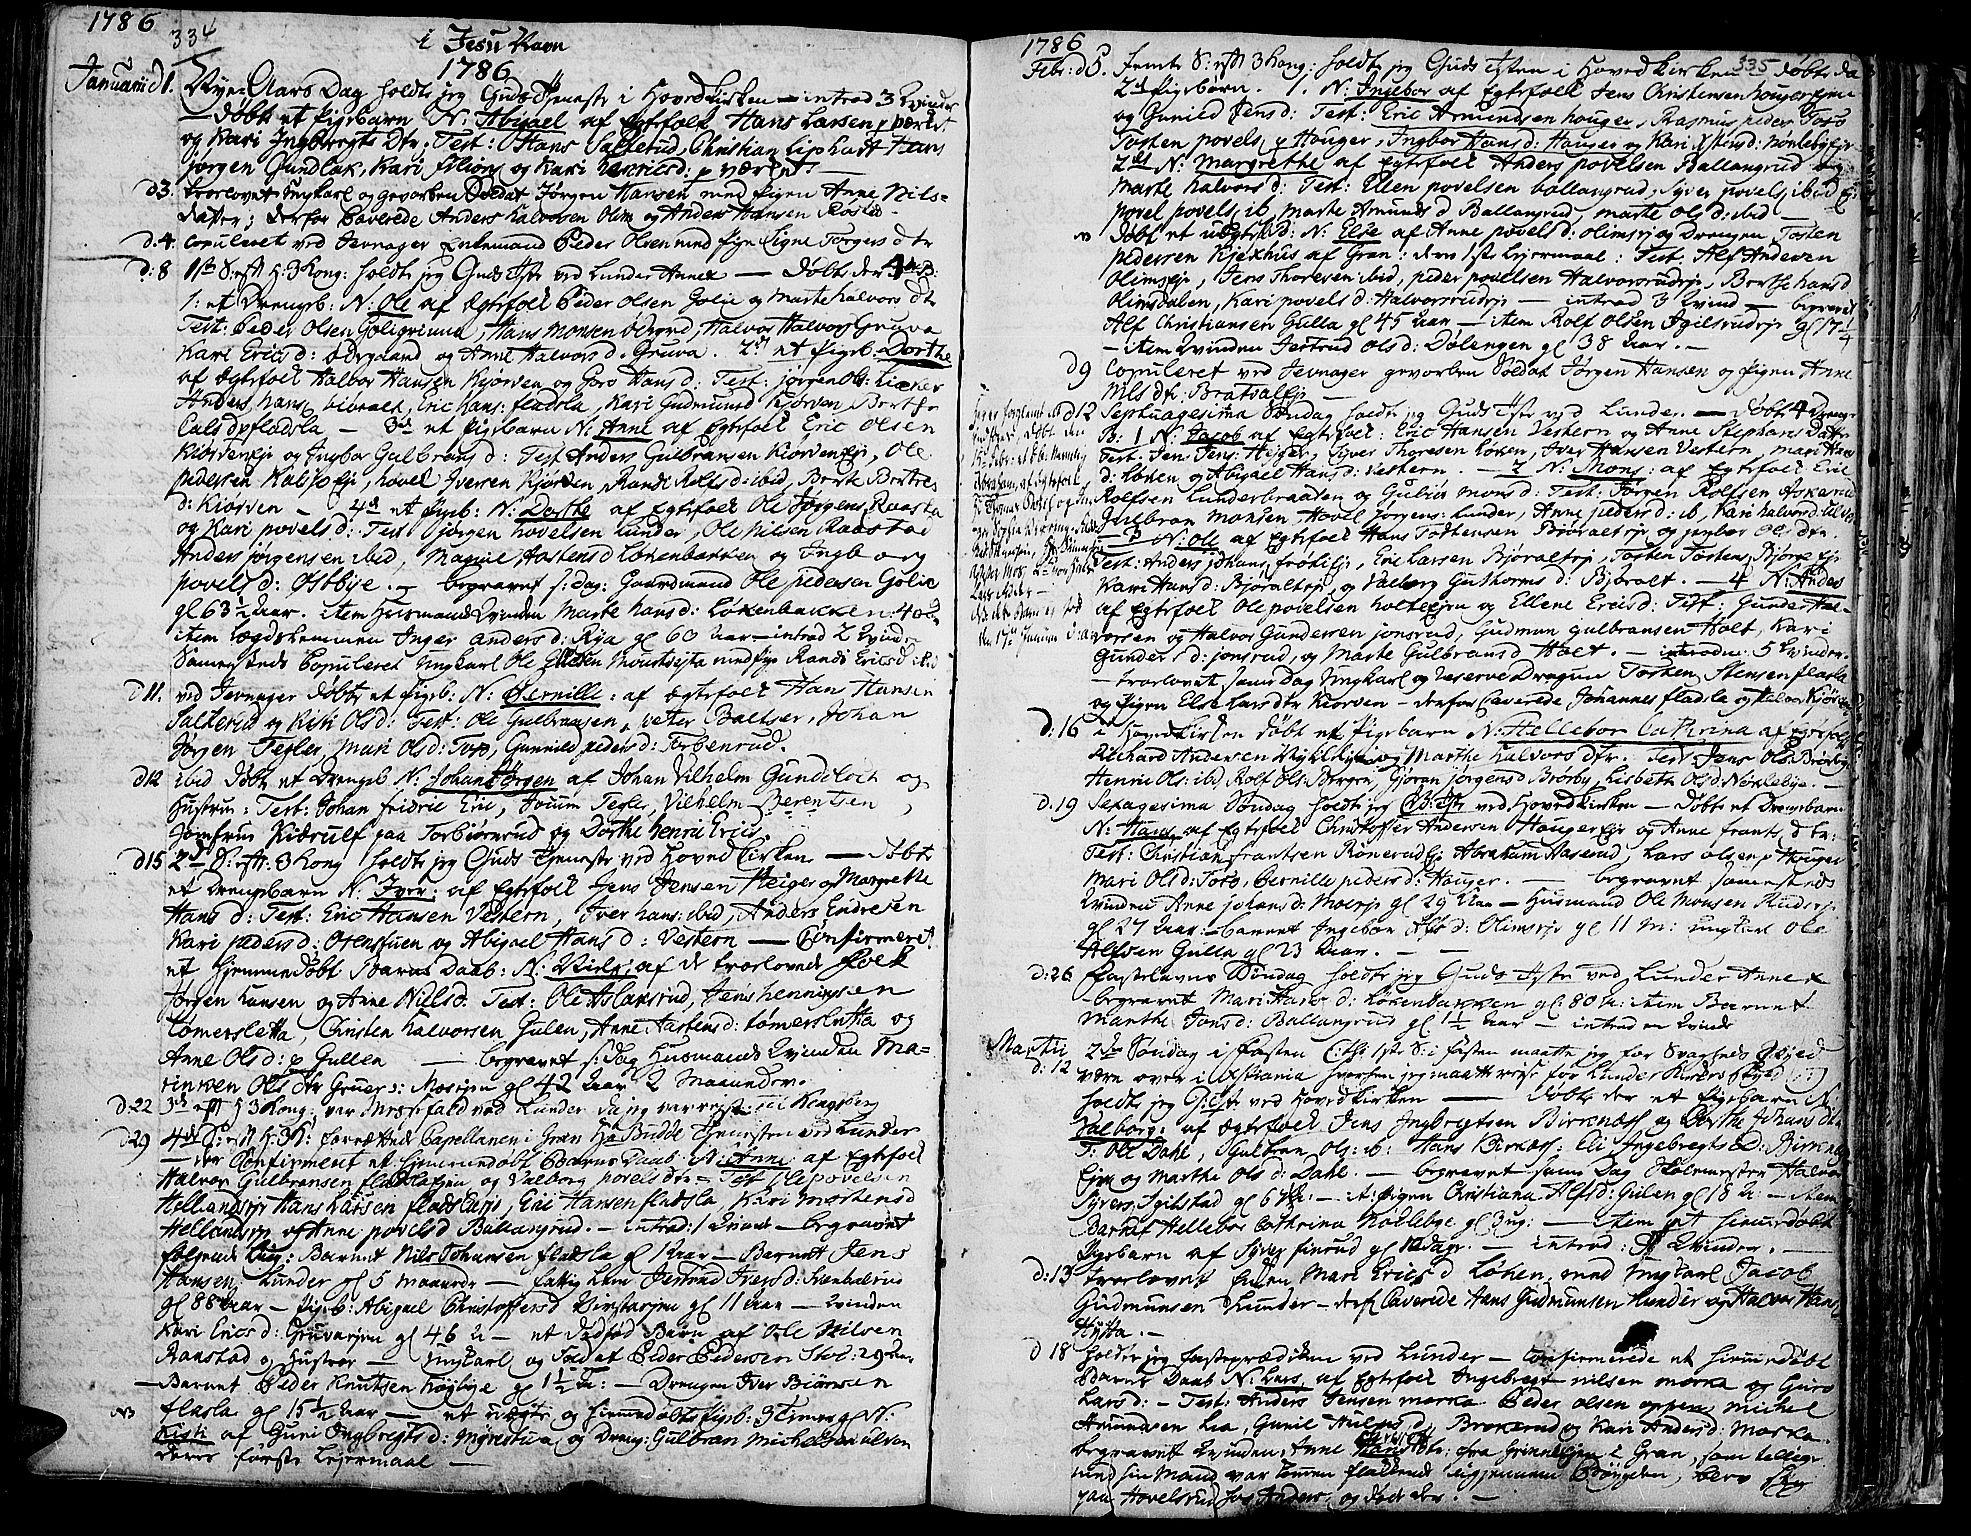 SAH, Jevnaker prestekontor, Ministerialbok nr. 3, 1752-1799, s. 334-335